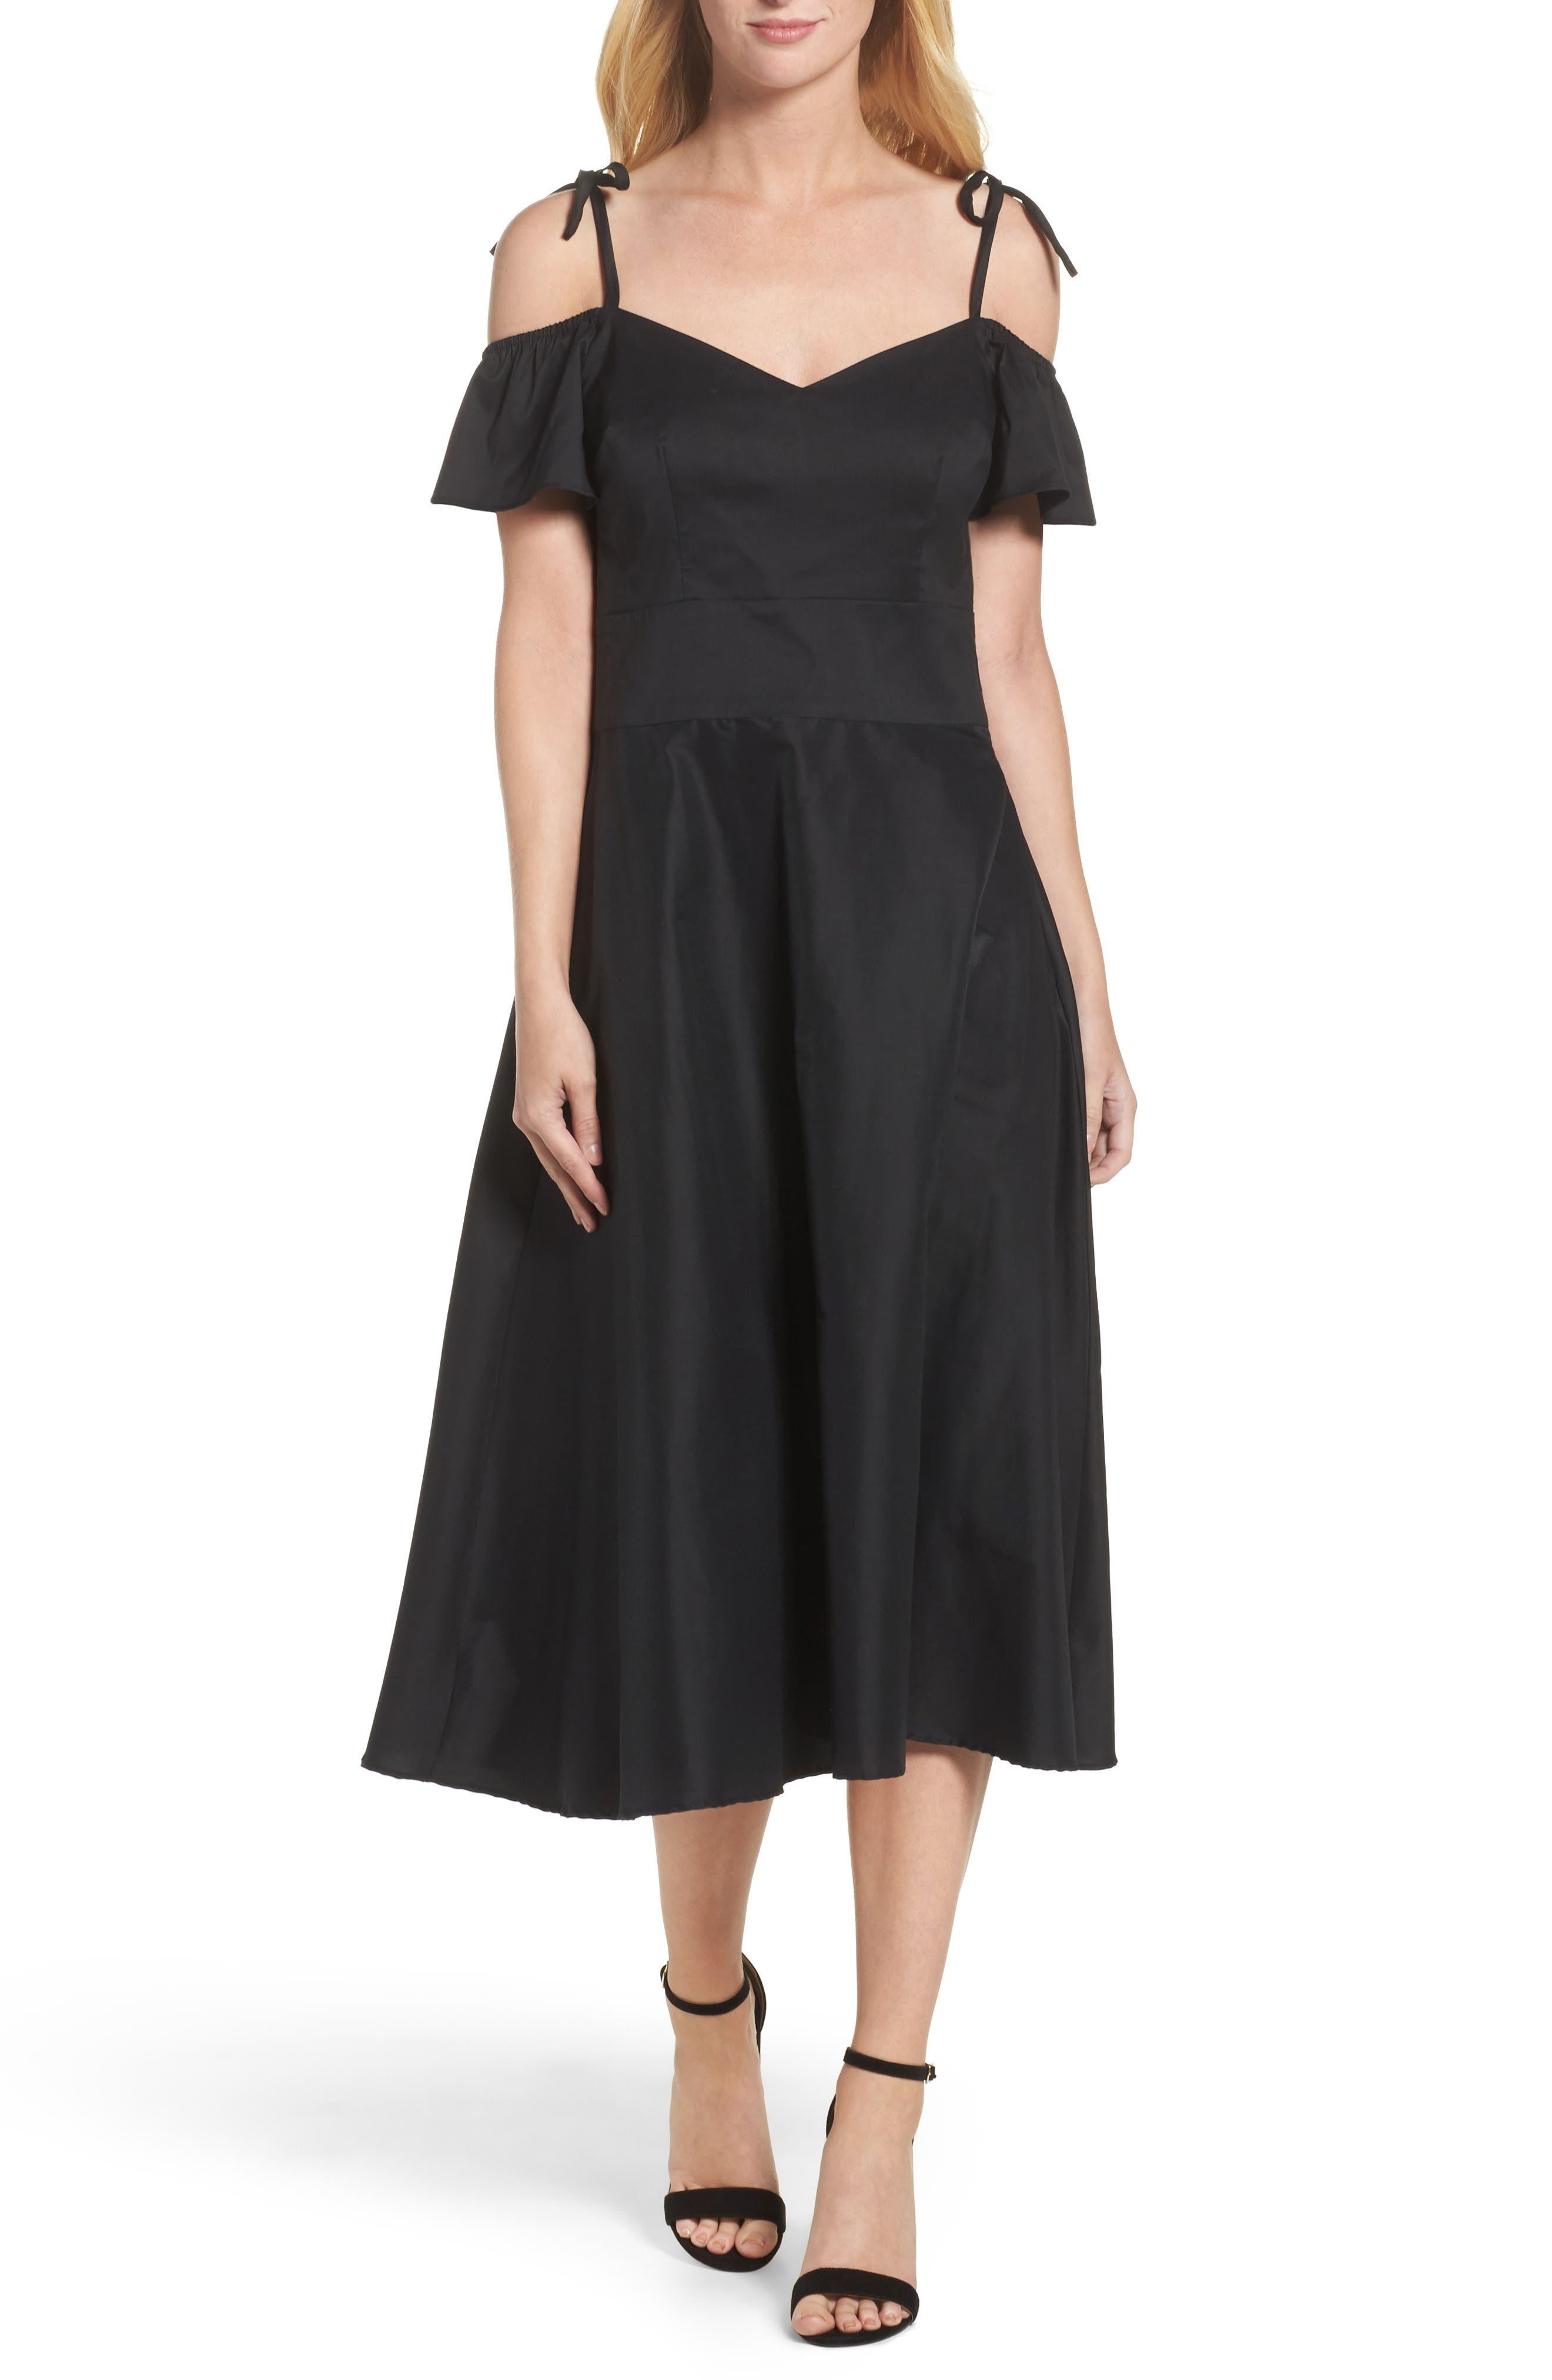 Betsey Johnson Fit & Flare Dress